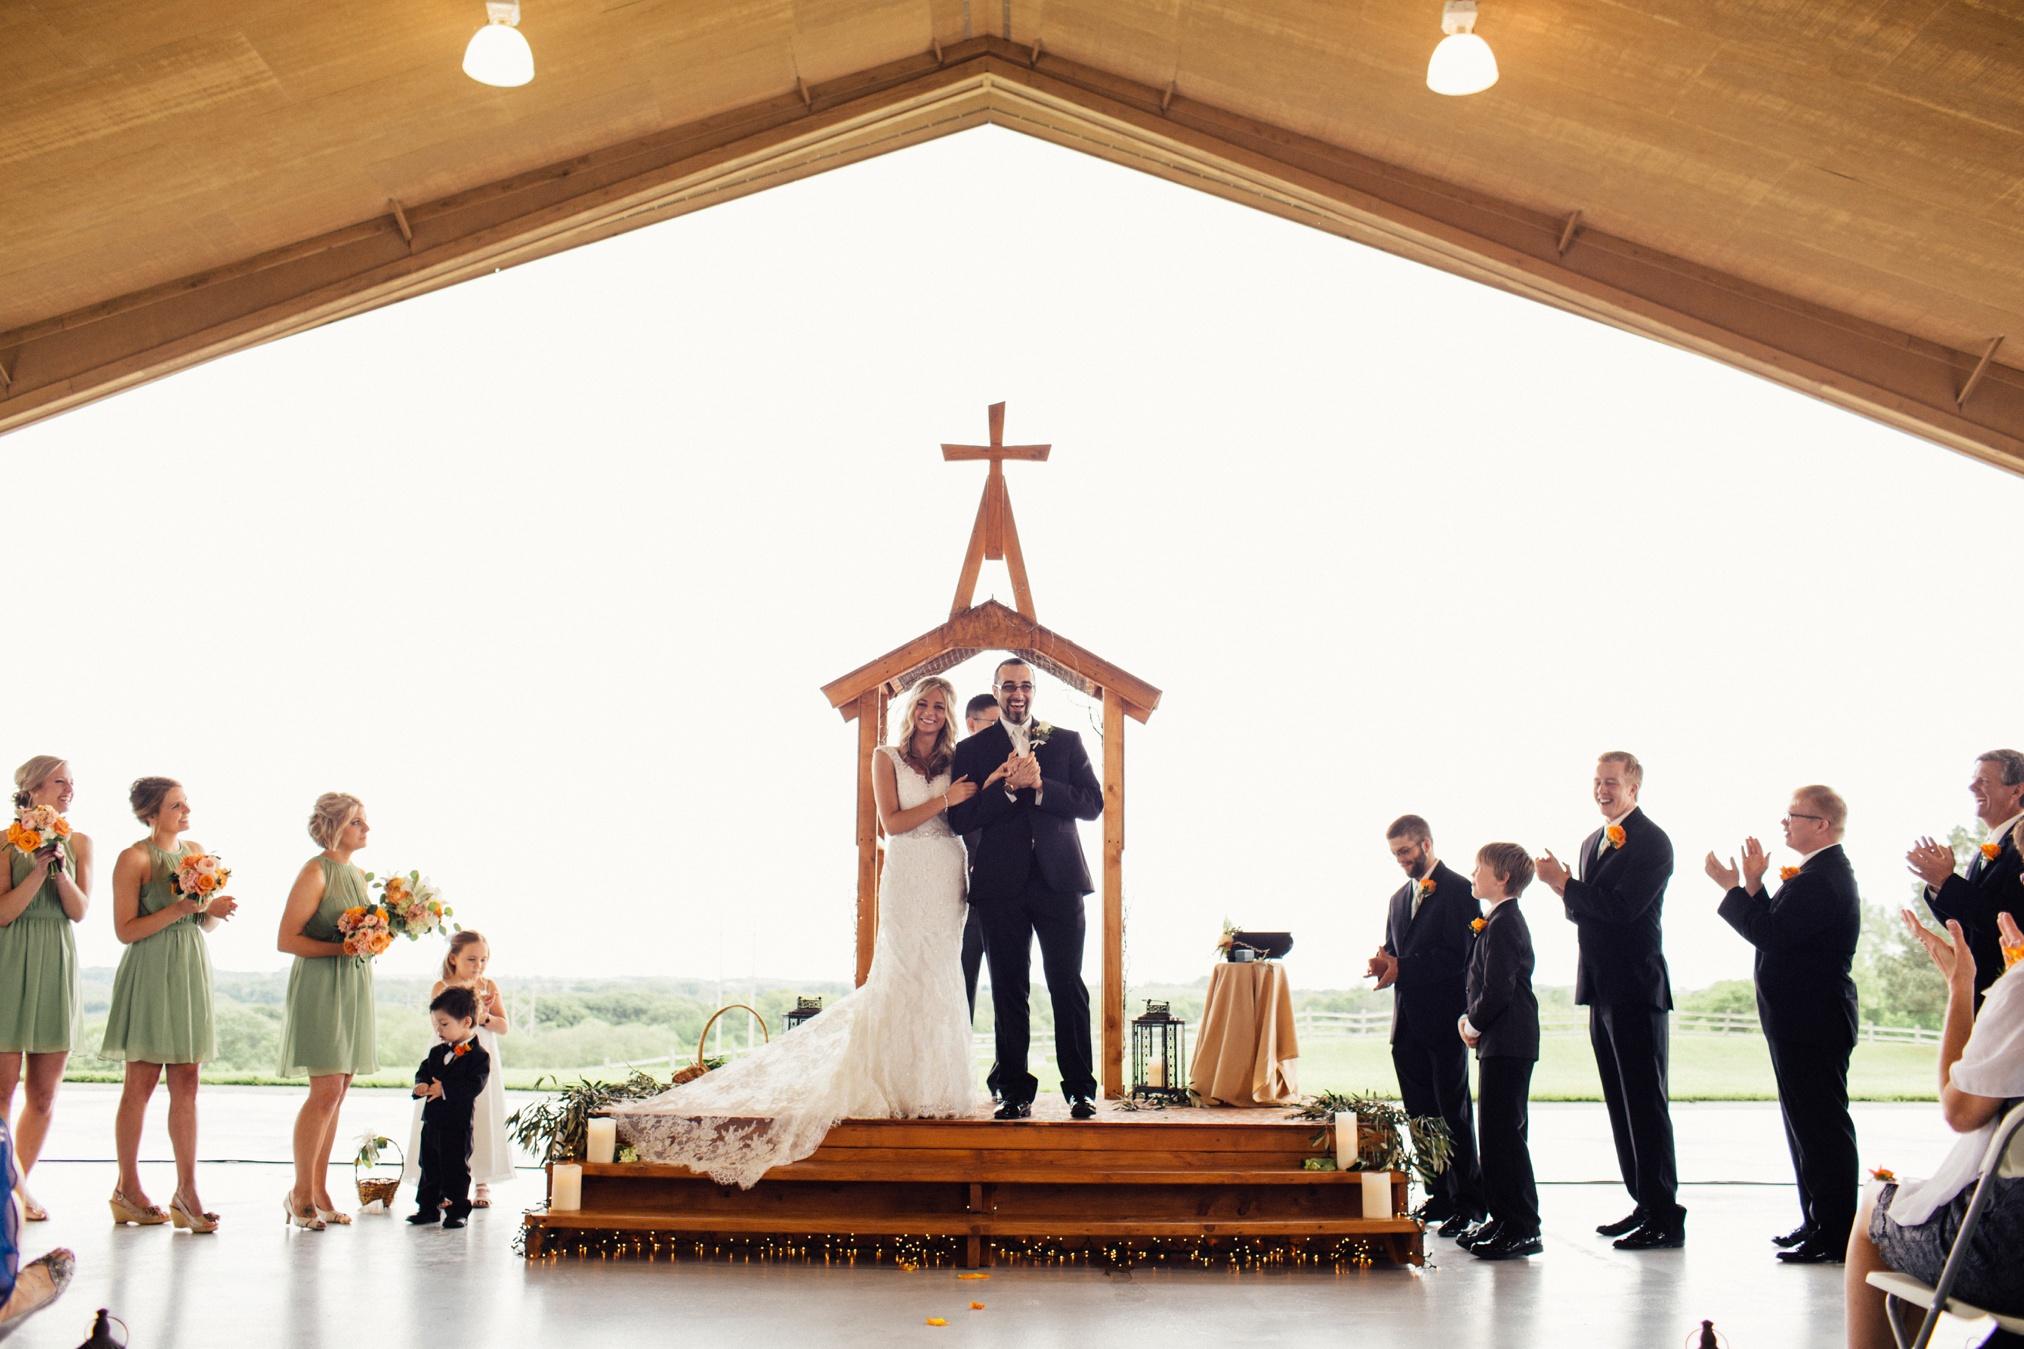 schmid_wedding-556.jpg